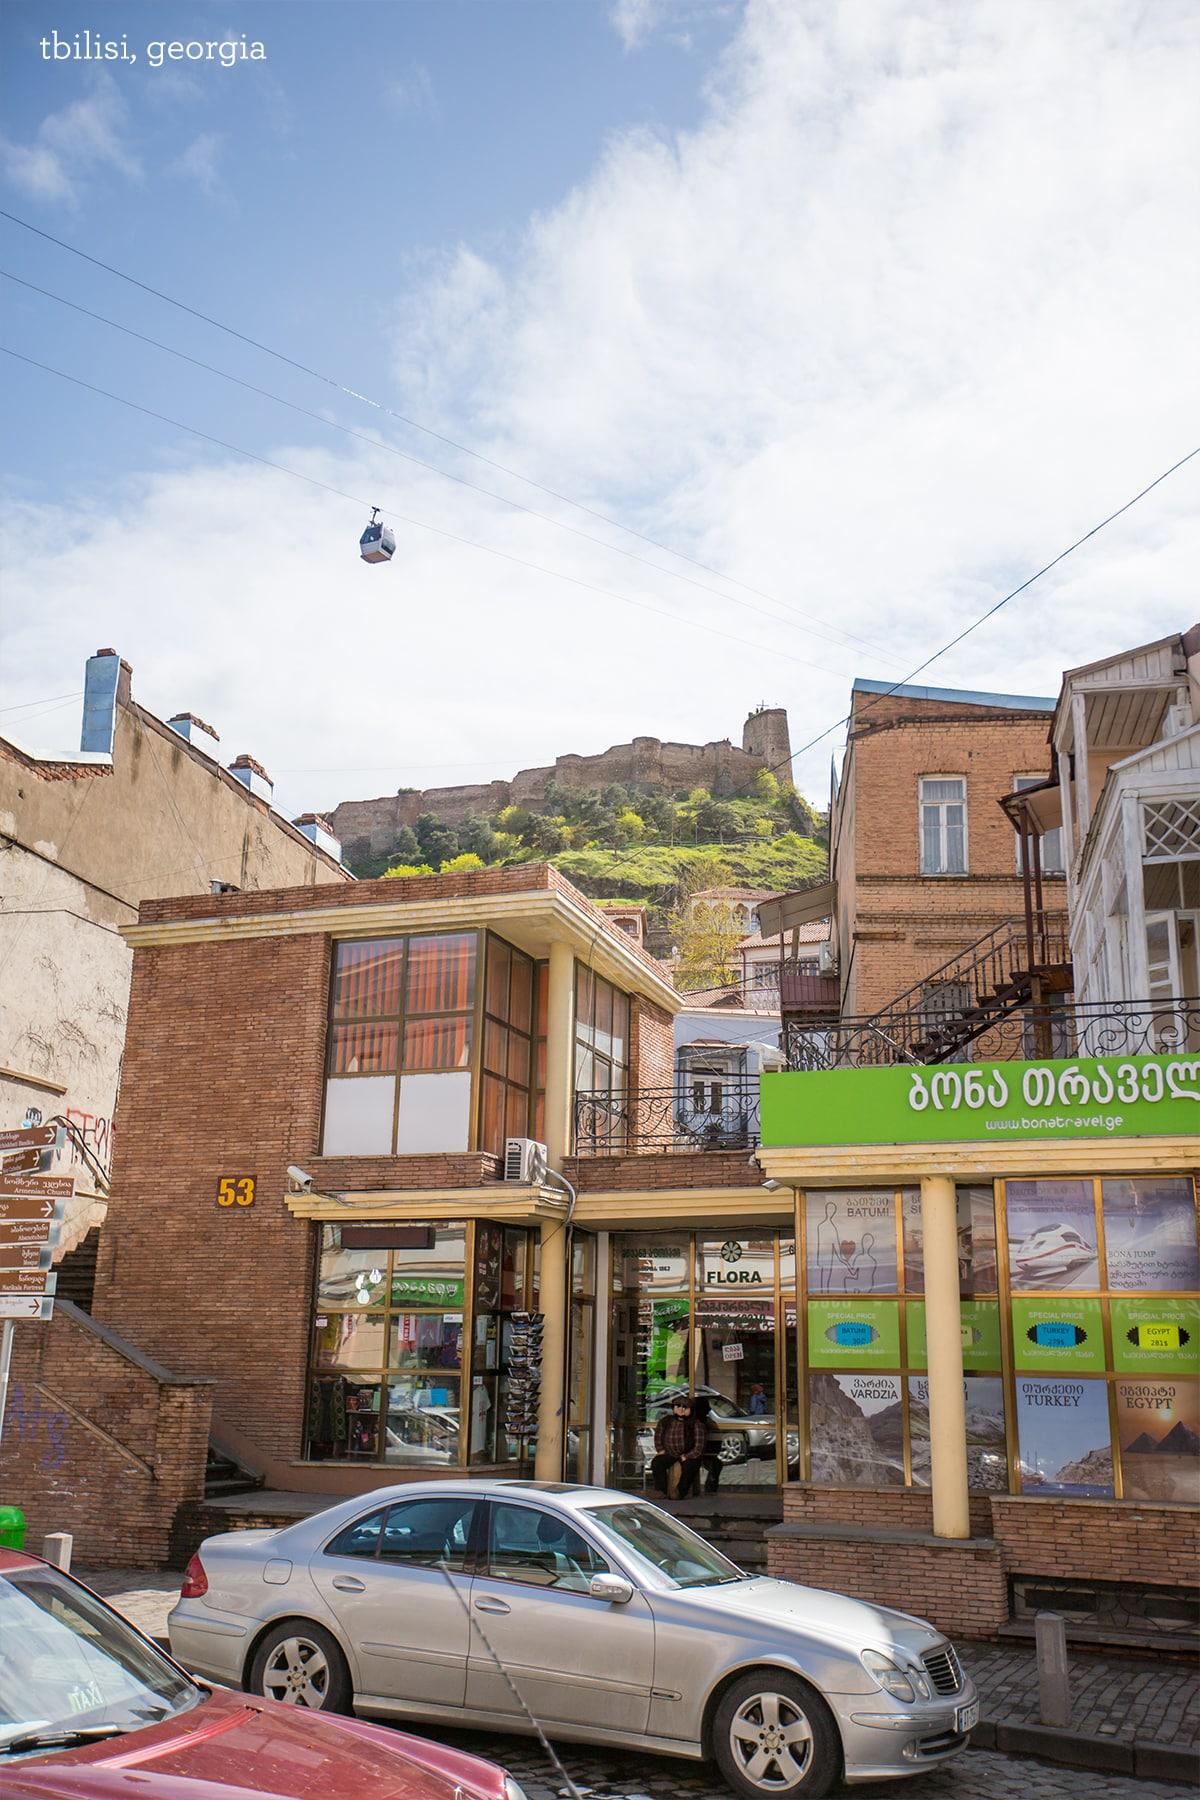 Narikala fortress above Tbilisi